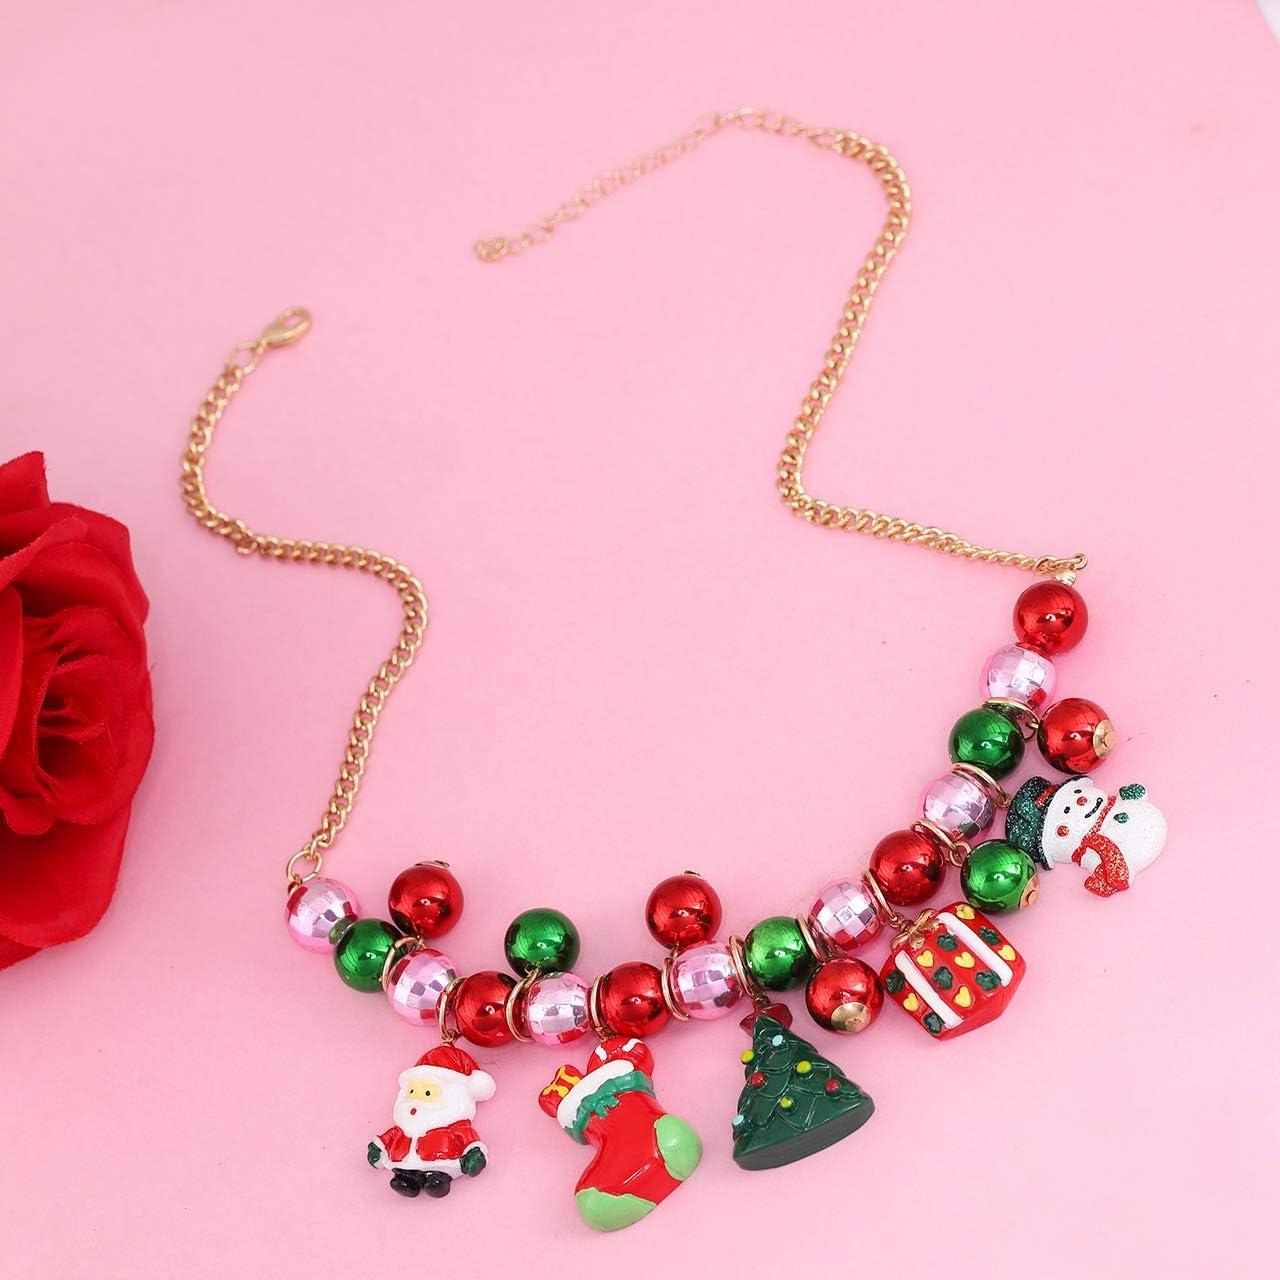 Bubble Gum Necklace Chunky Necklace Statement Necklace Red Necklace Christmas Necklace Wedding Holiday Necklace Bridesmaids